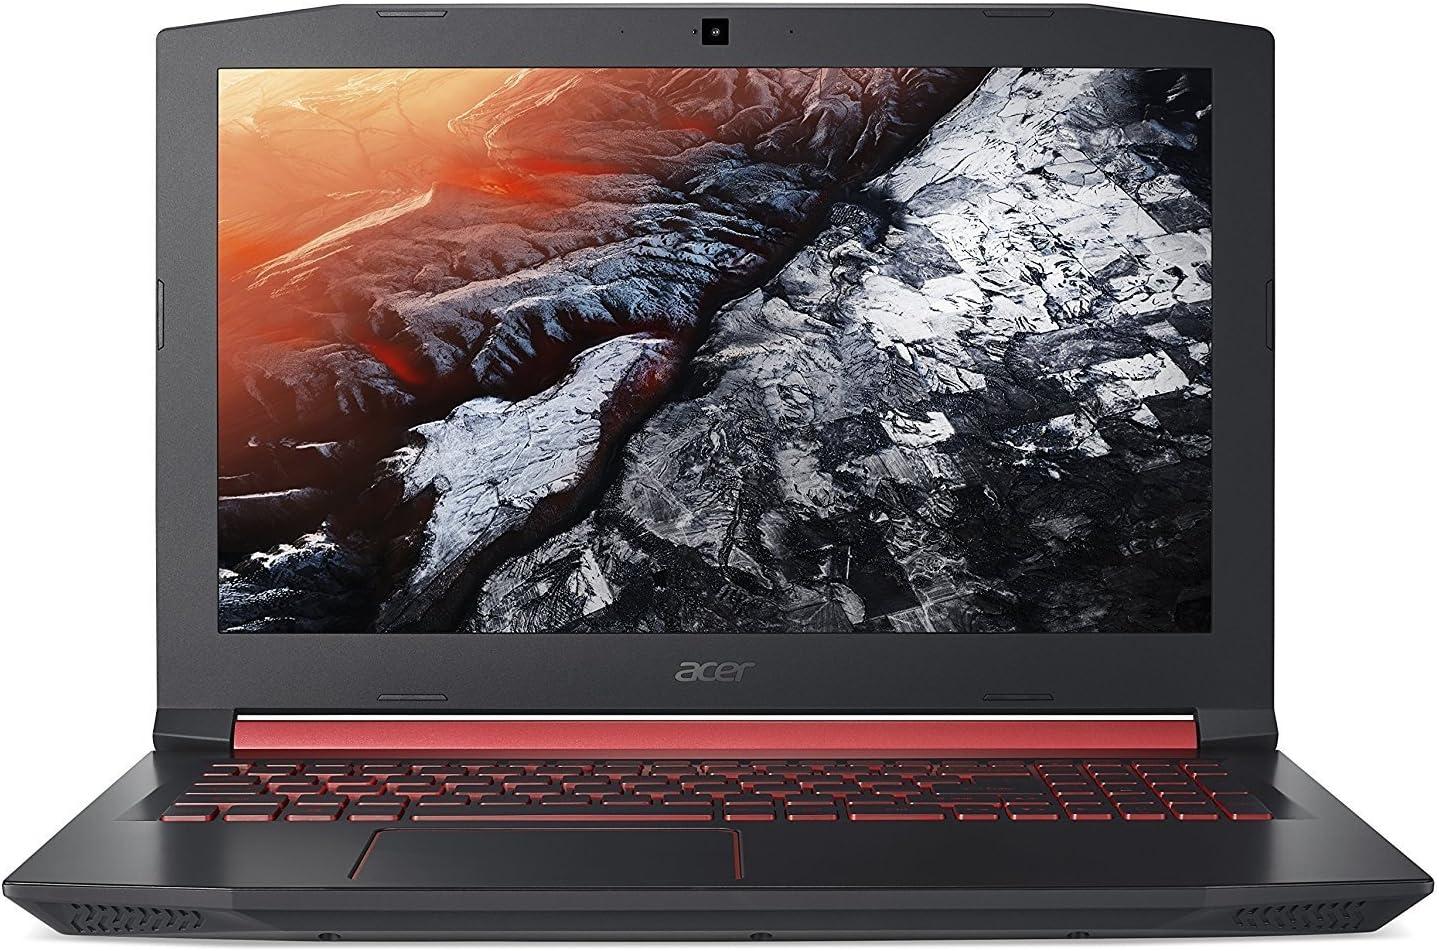 2018 Flagship Acer Nitro 5 Gaming VR Ready Laptop (15.6 Inch FHD Display, Intel Core i5-7300HQ 2.5GHz, 8GB RAM, 256GB SSD + 1TB HDD, NVIDIA GTX 1050 4GB Graphics, Windows 10) (Certified Refurbished)